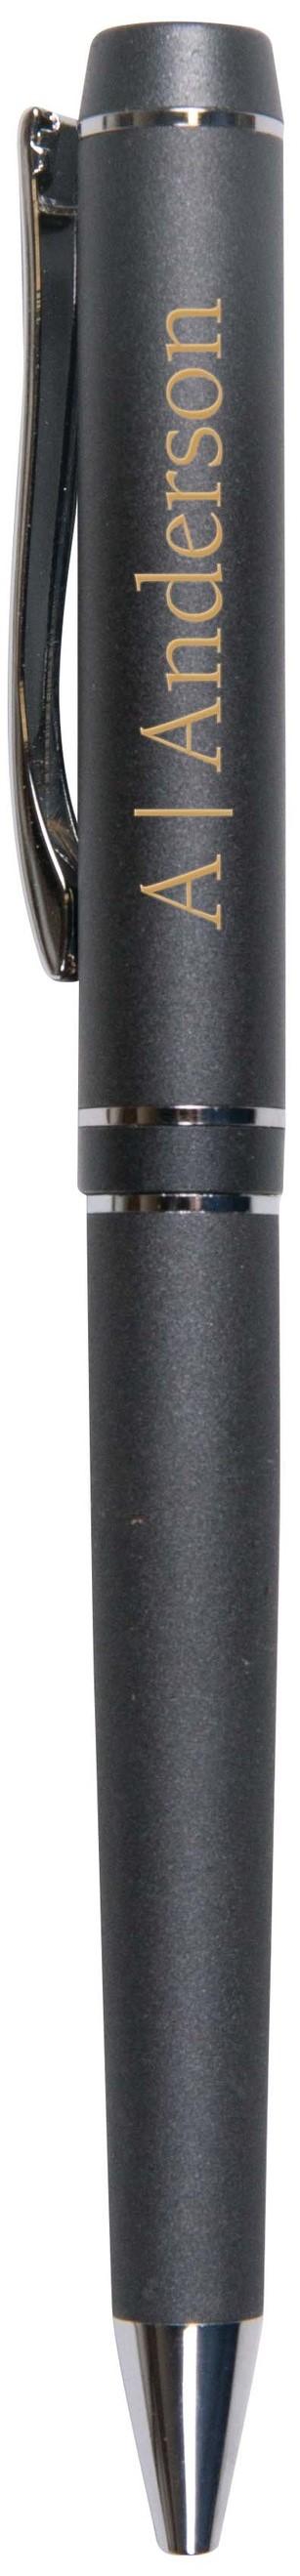 Metal Pen 6